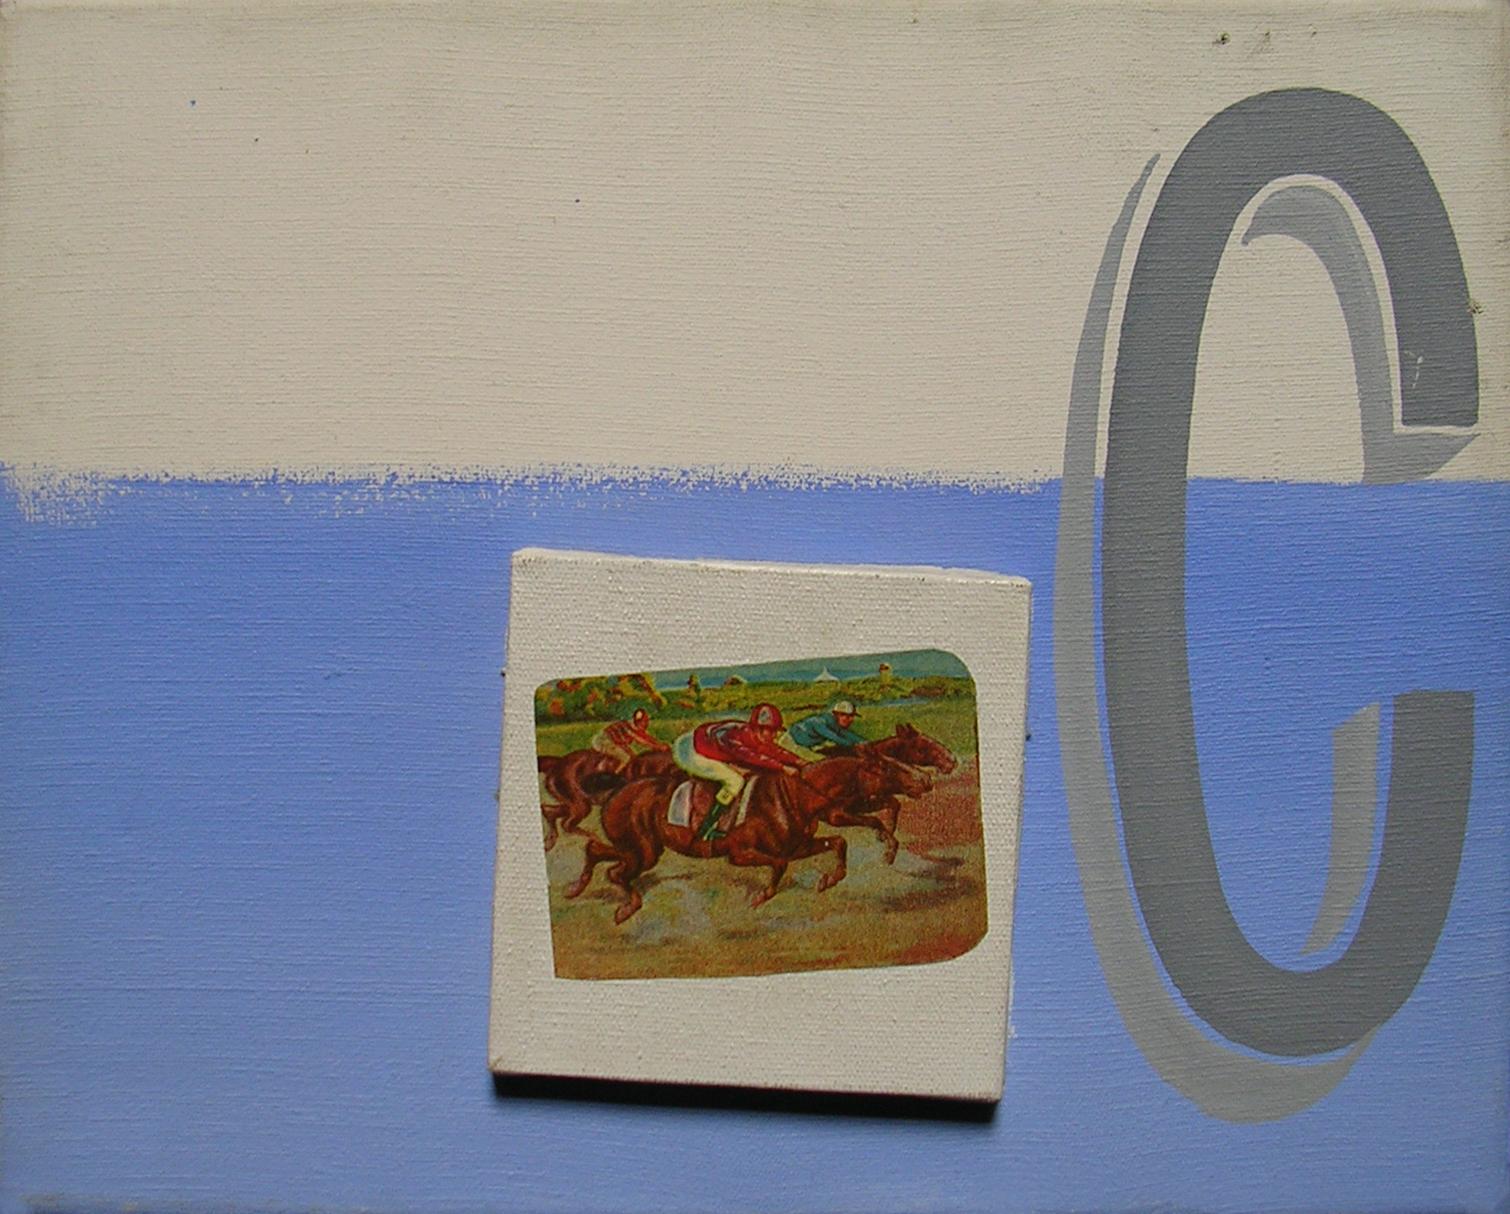 Abecedario C; objetos ensamblados, tela, papel sobre bastidor, 30 cm x 40 cm, 2007